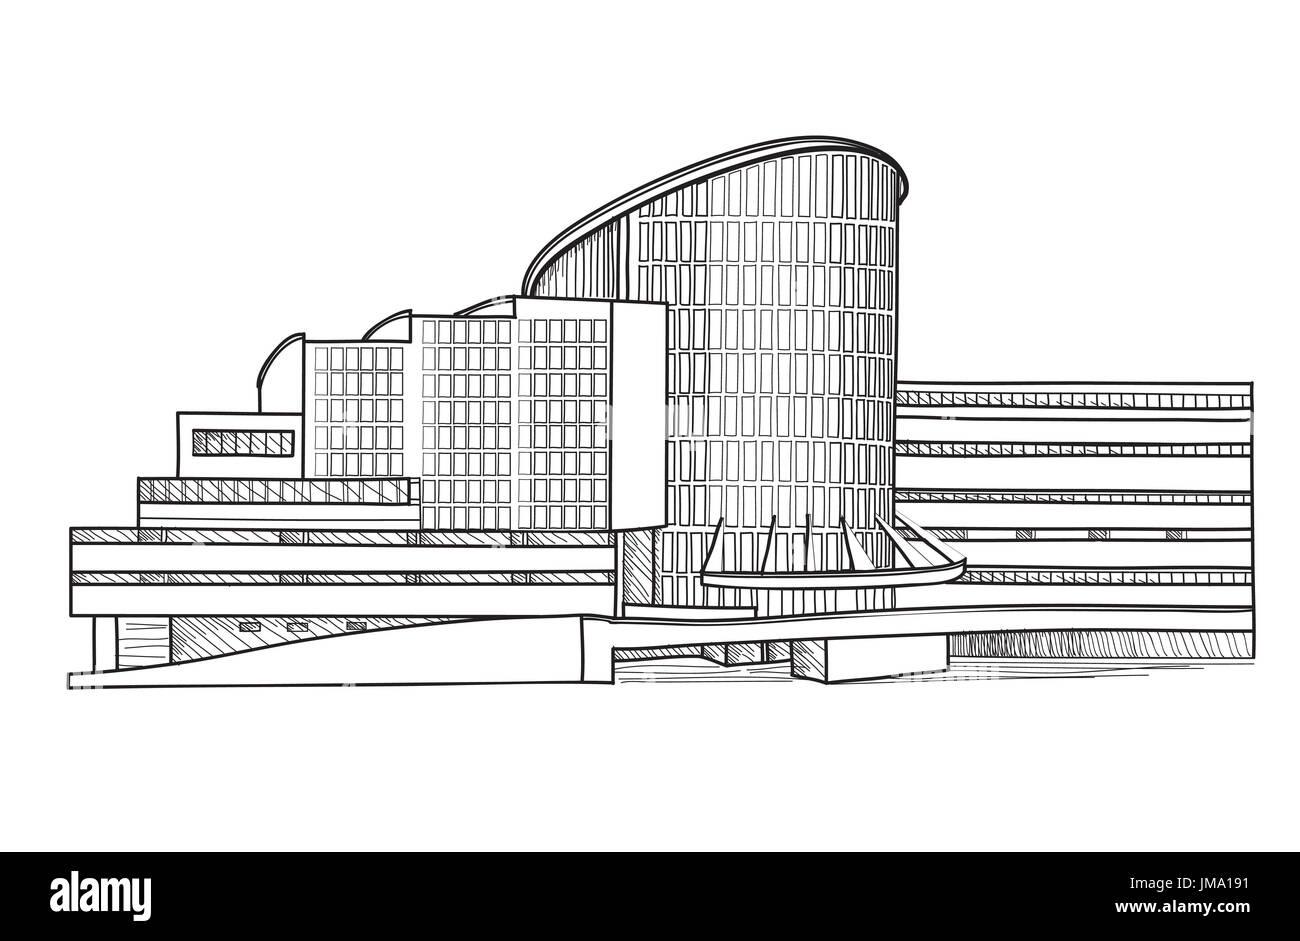 City building sketch isolated. Urban house facade blueprint. - Stock Image